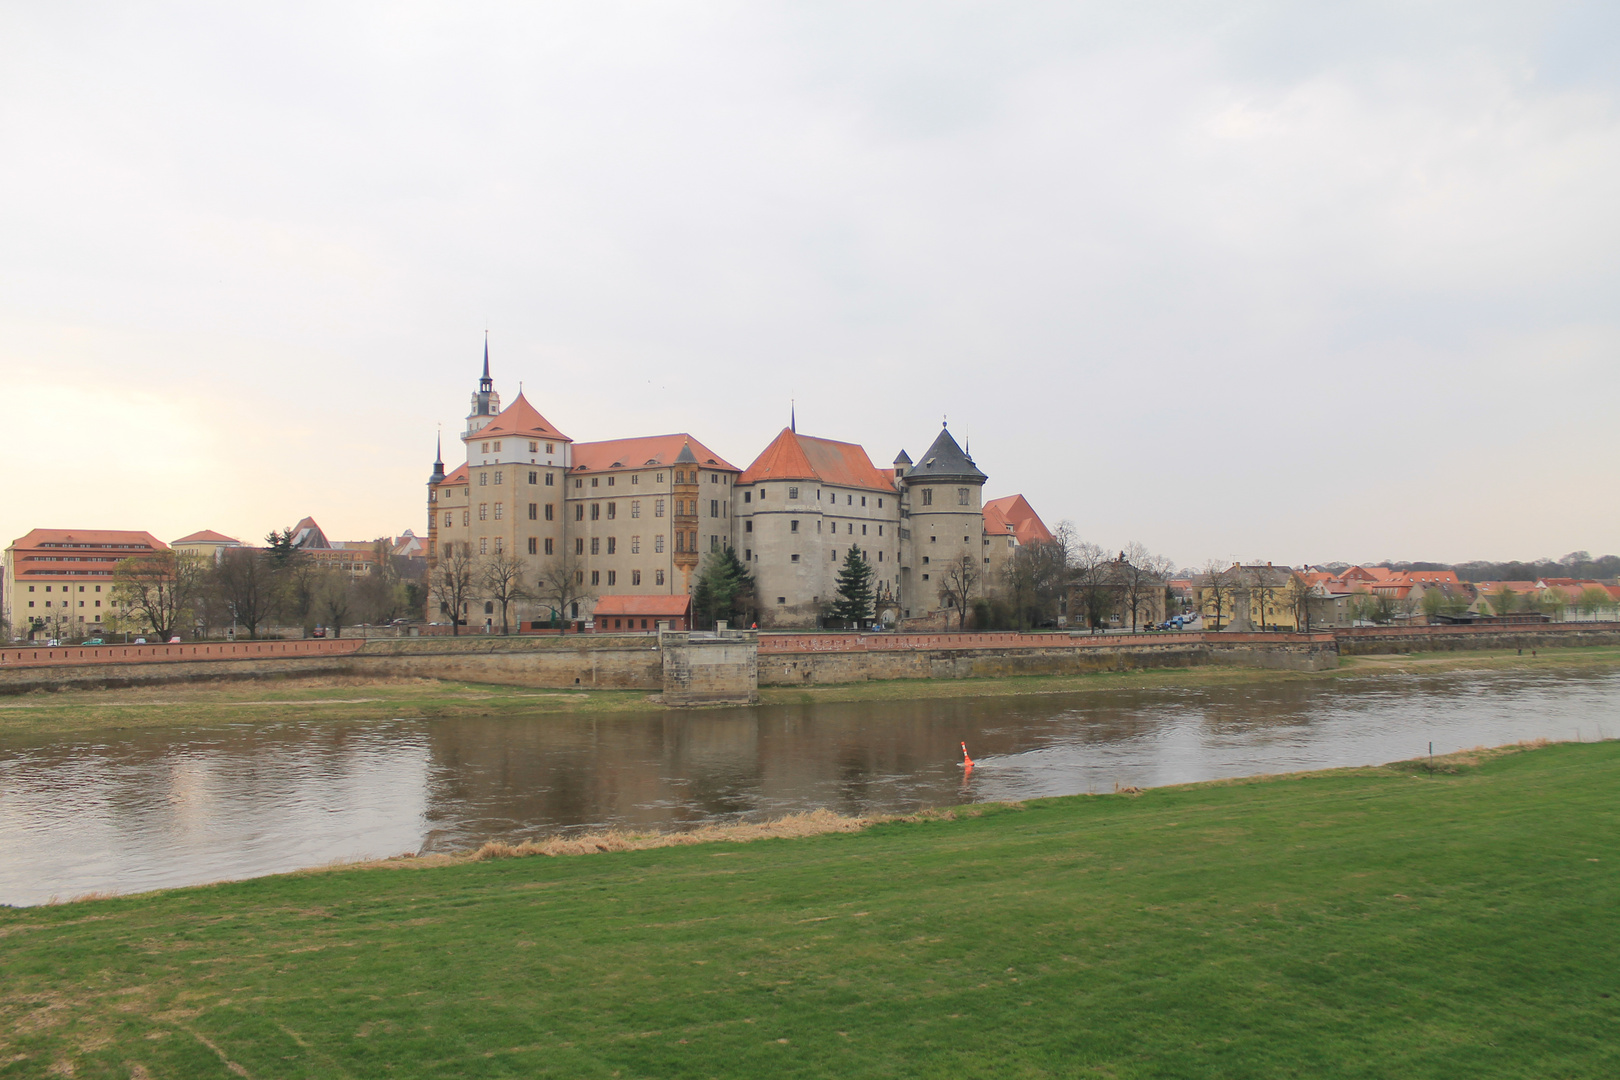 Schloß Hartenfels in Torgau/Elbe